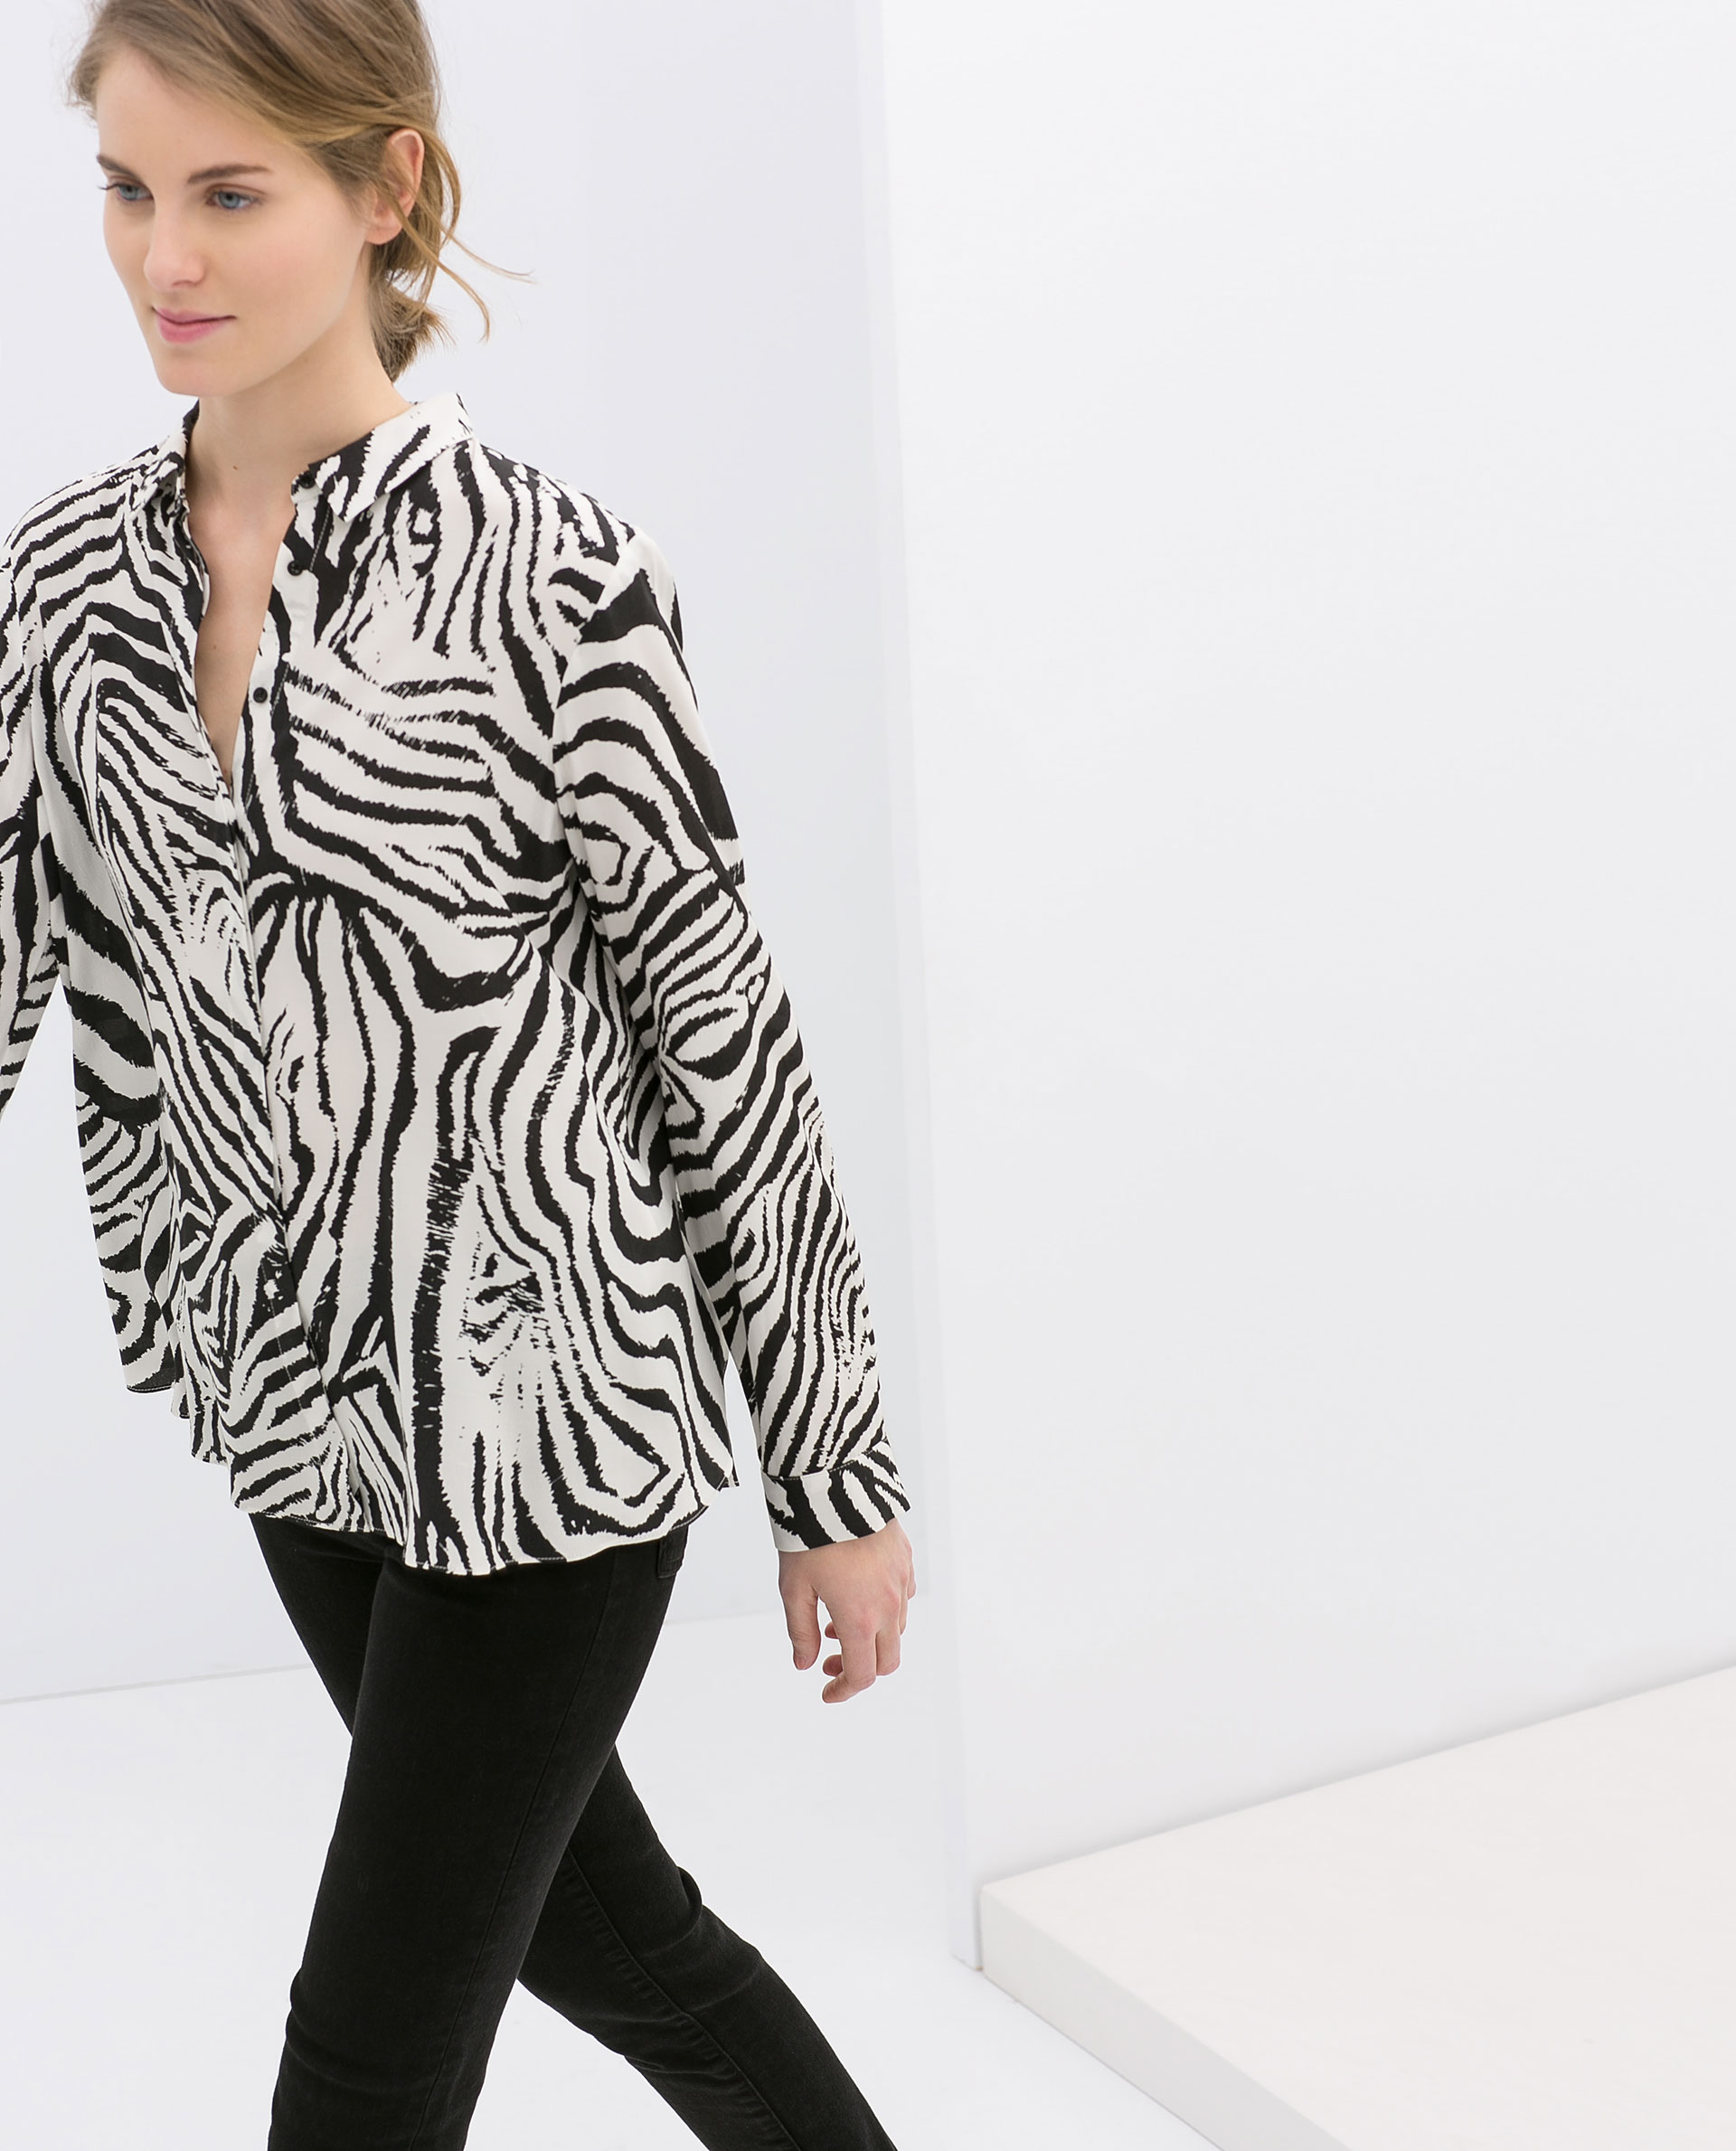 Zara Zebra Print Blouse 20